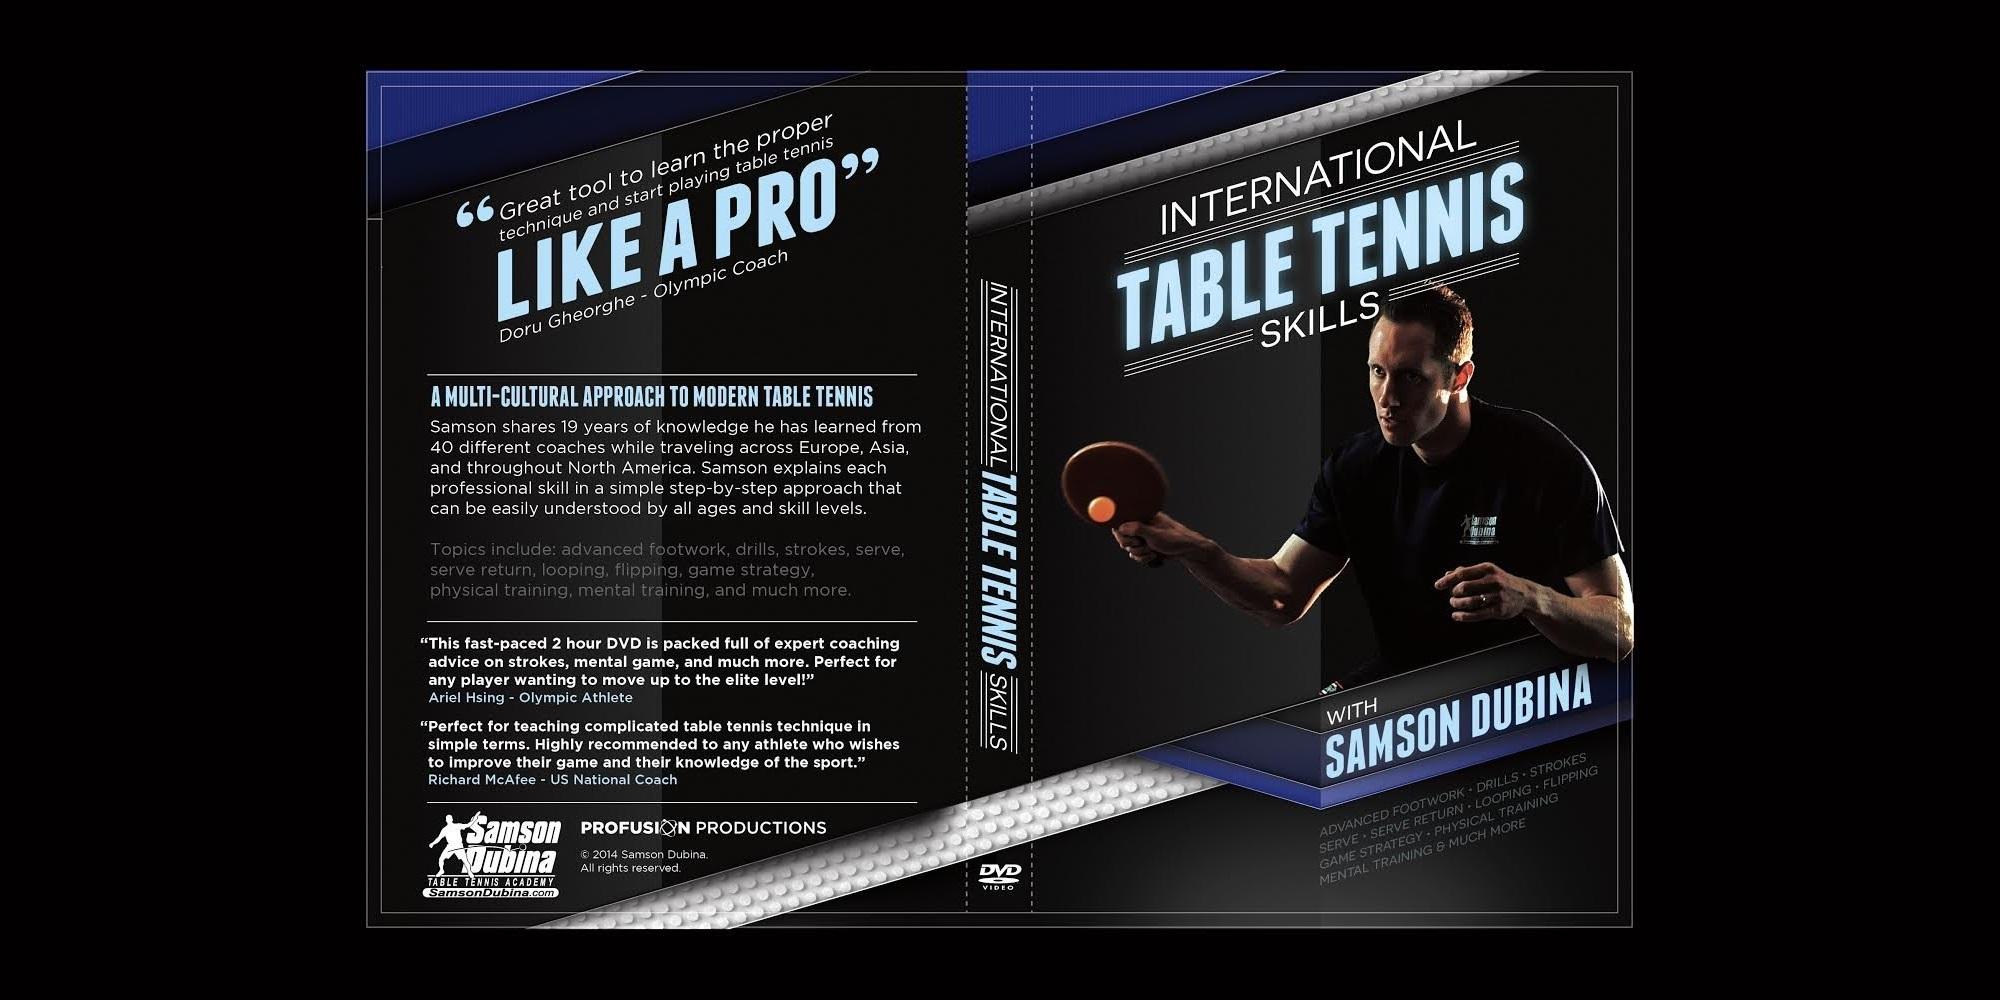 Samson Dubina DVD Review